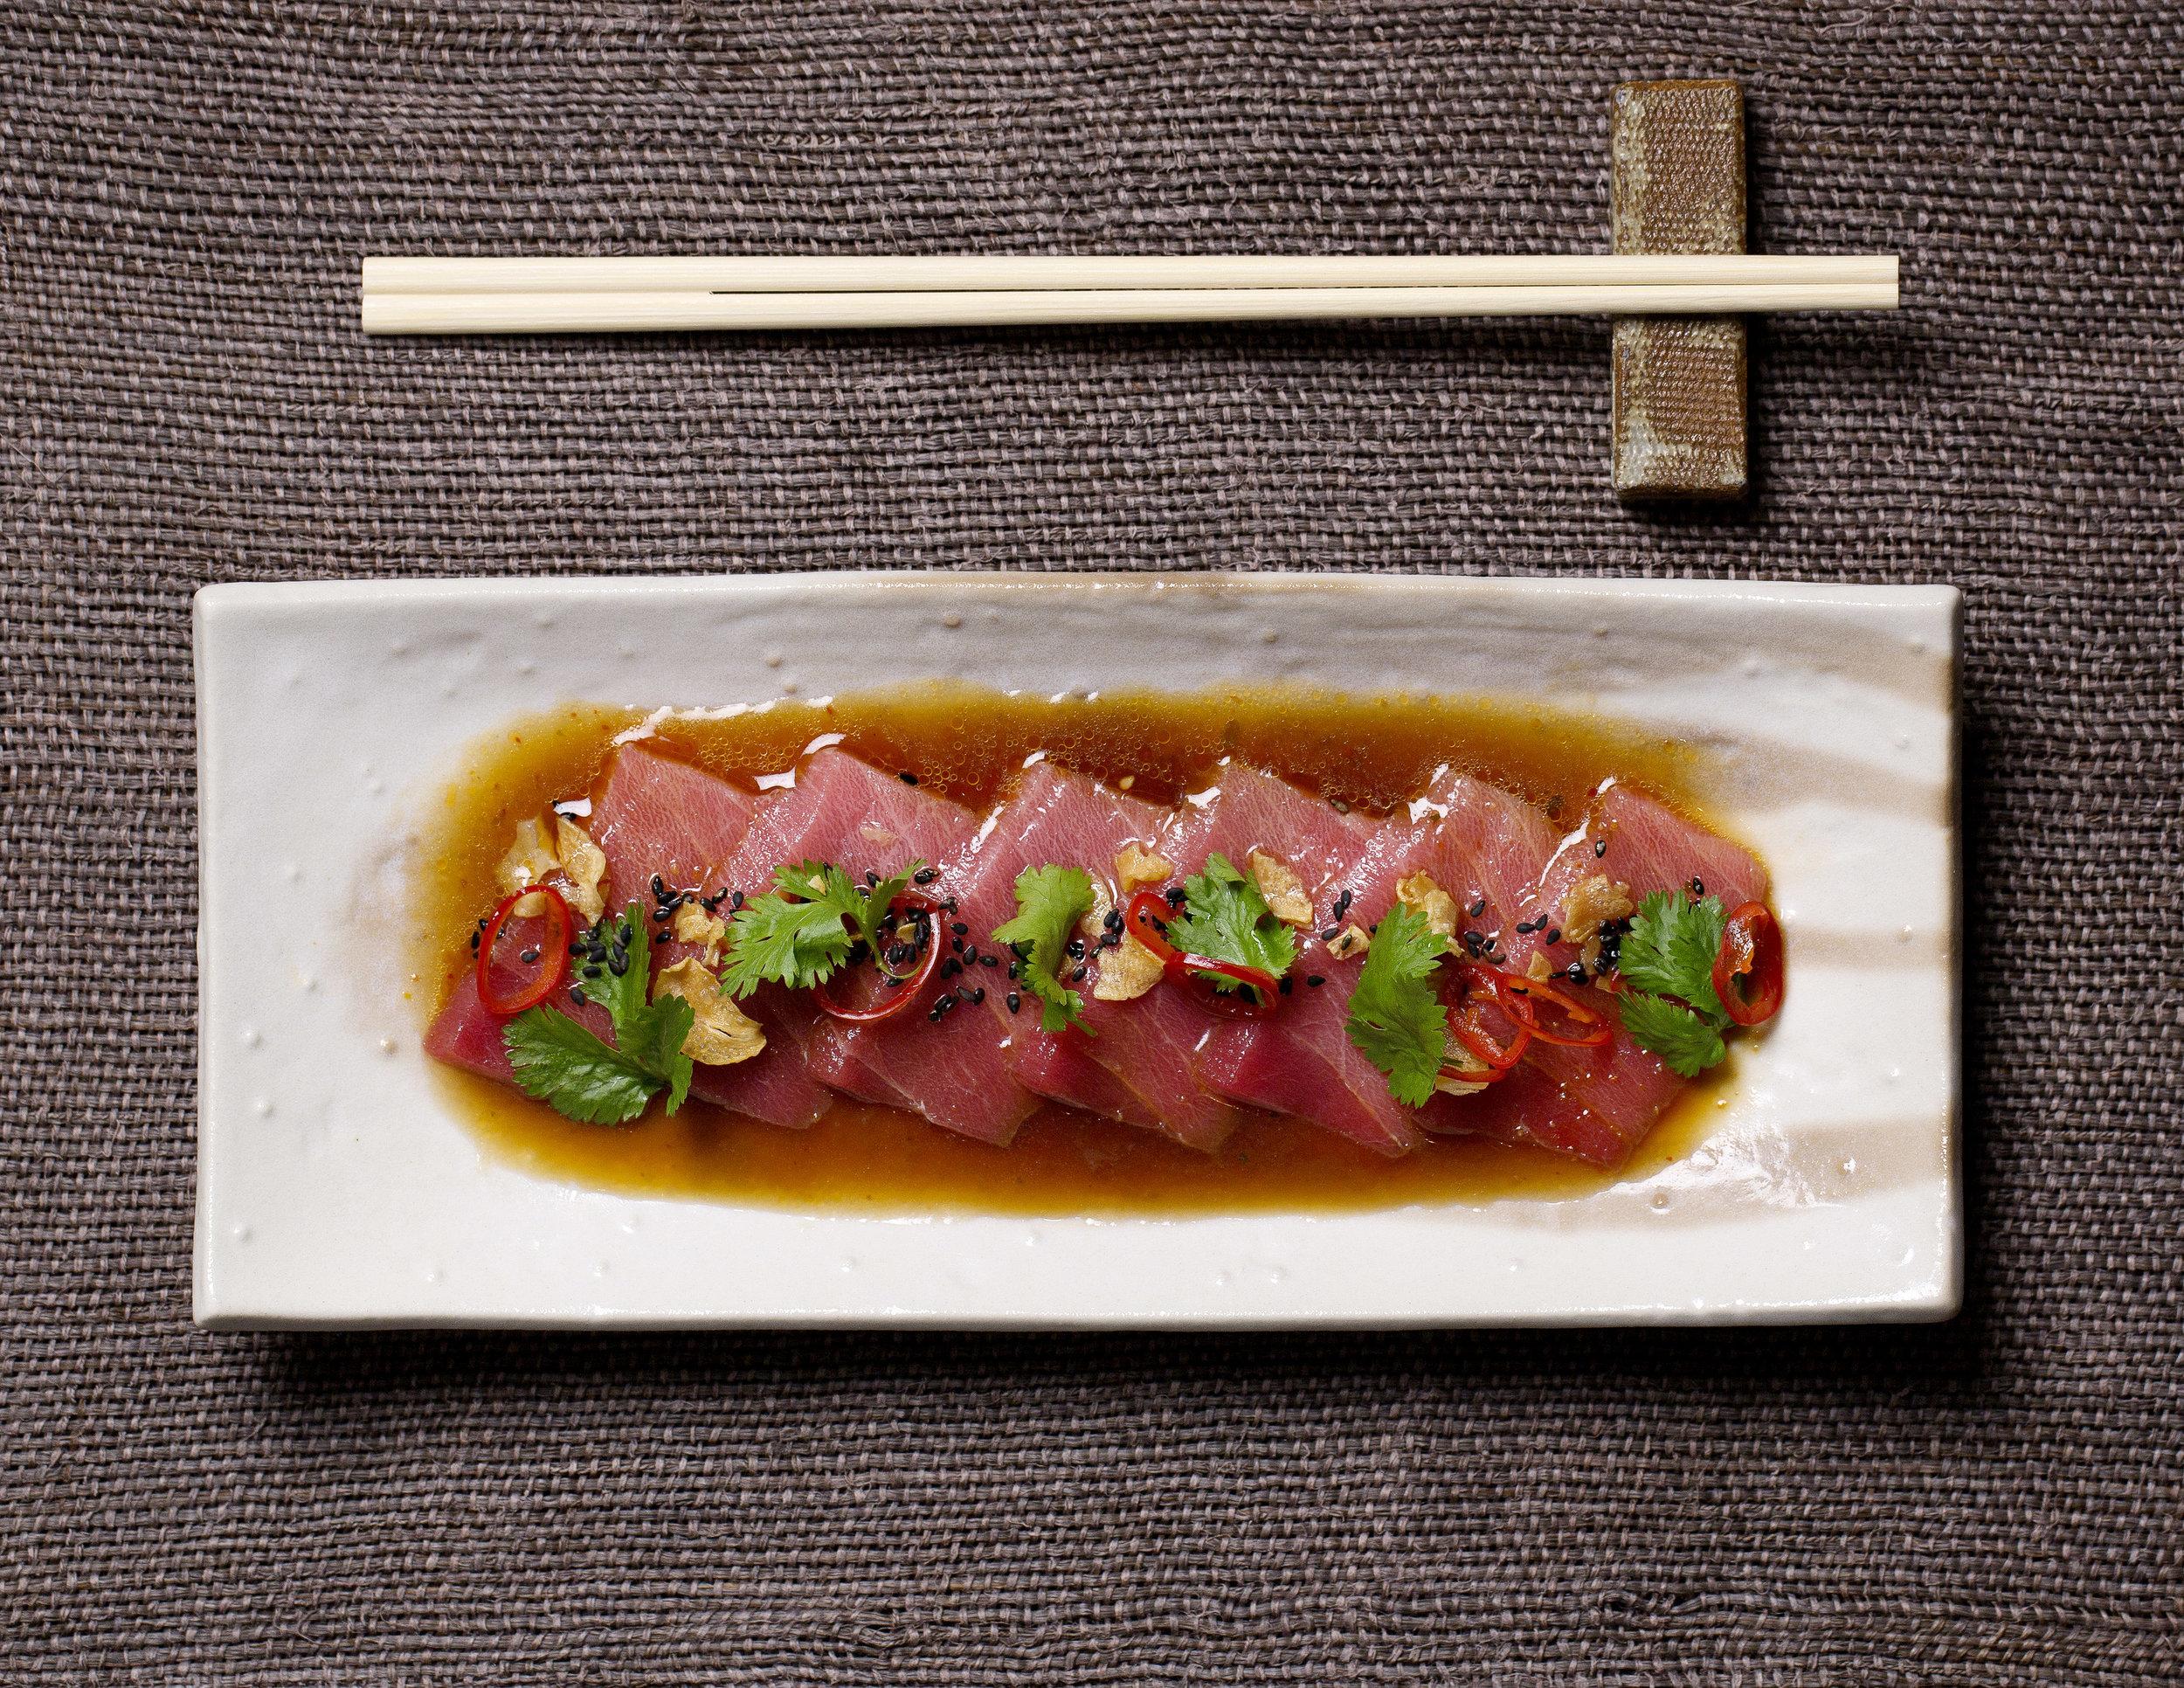 thinly sliced semi fatty tuna, chilli, coriander and sesame - chu toro no oasashimi kousou fuumi.jpg